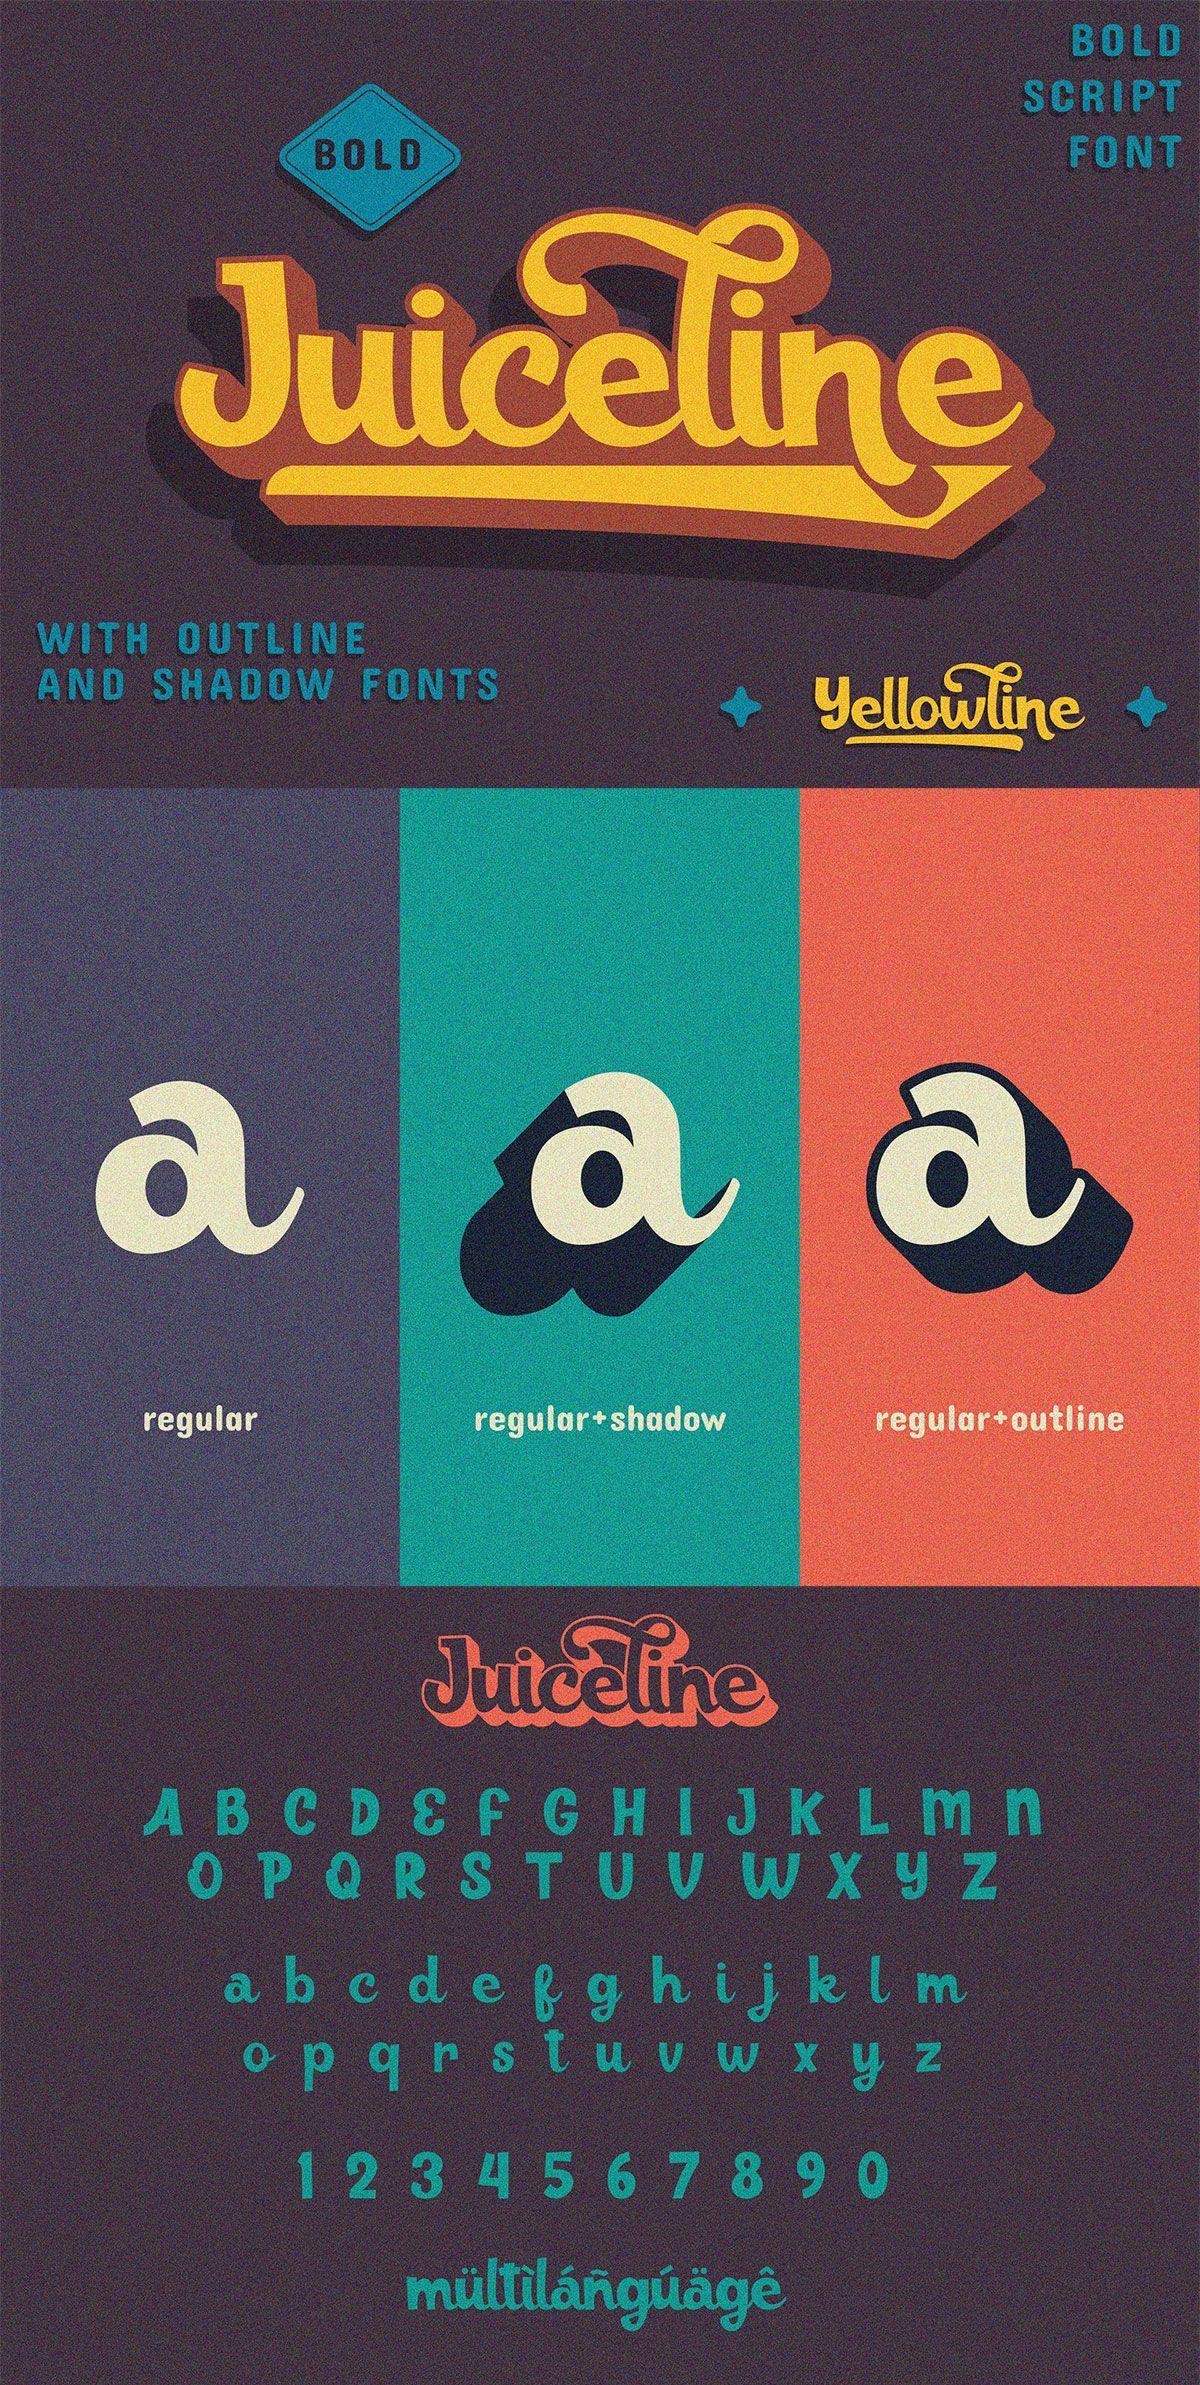 Free Juiceline Bold Script Font